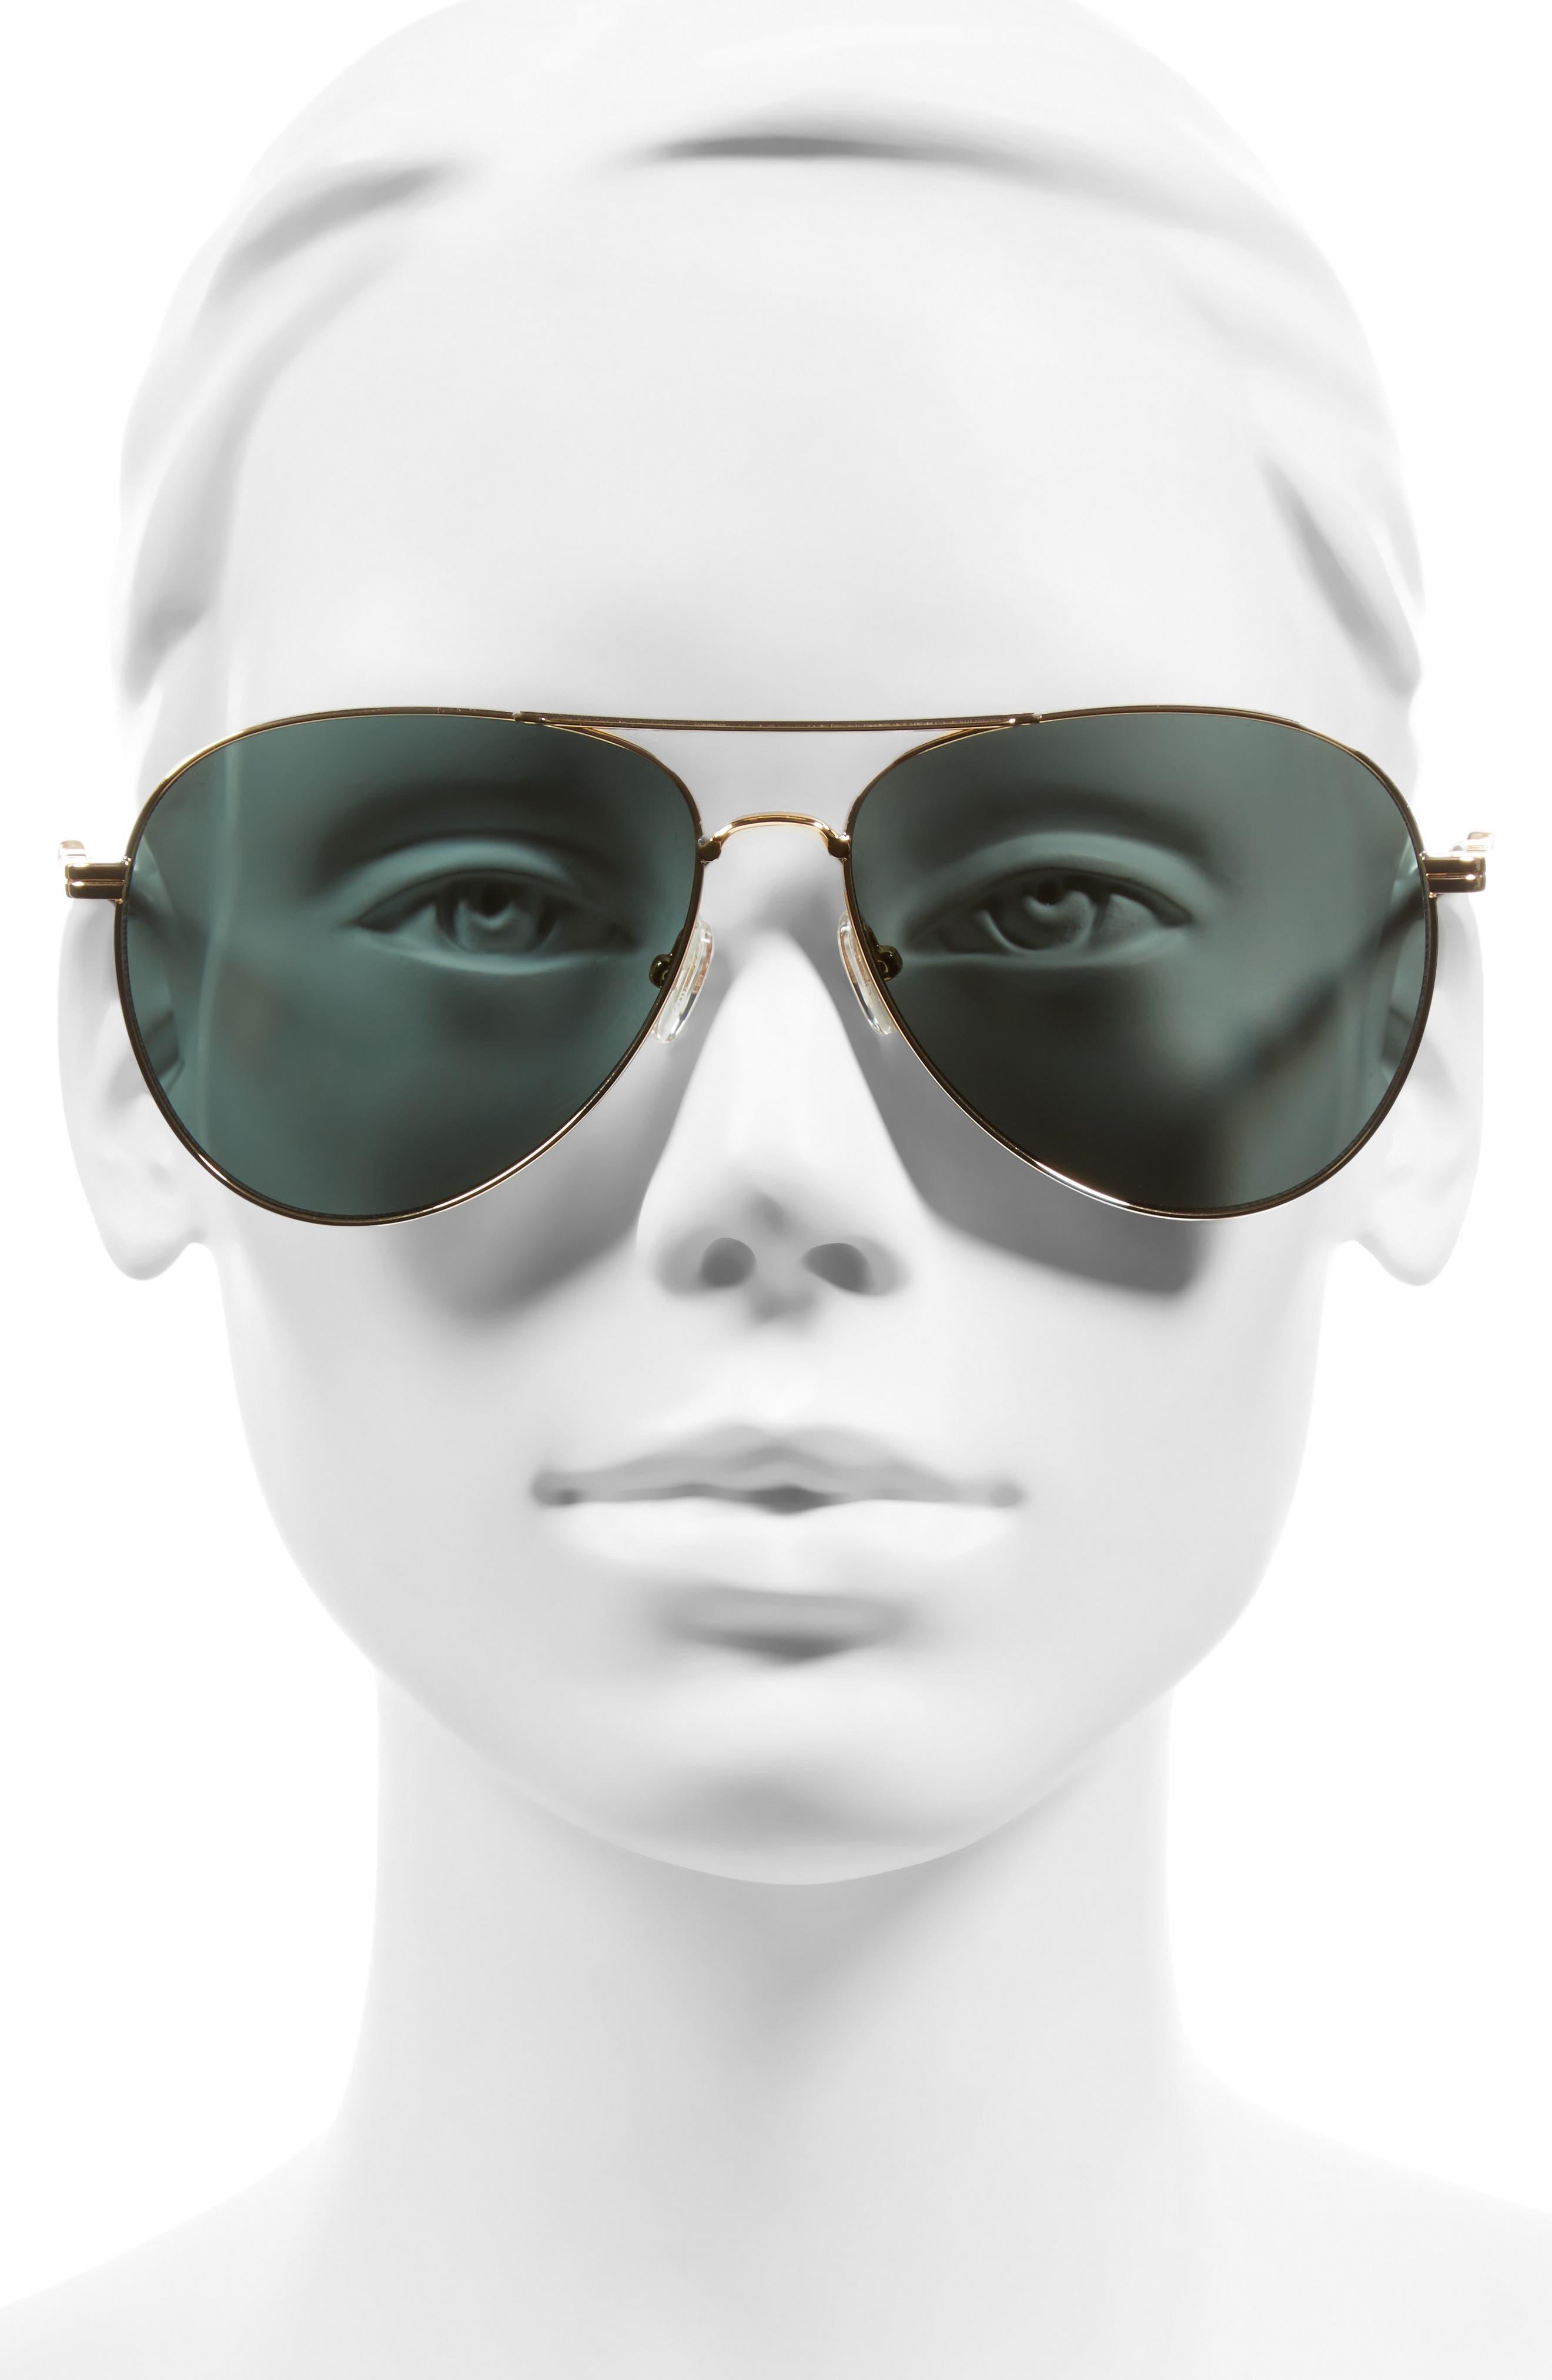 Lodi 62mm Mirrored Aviator Sunglasses,                             Alternate thumbnail 4, color,                             710